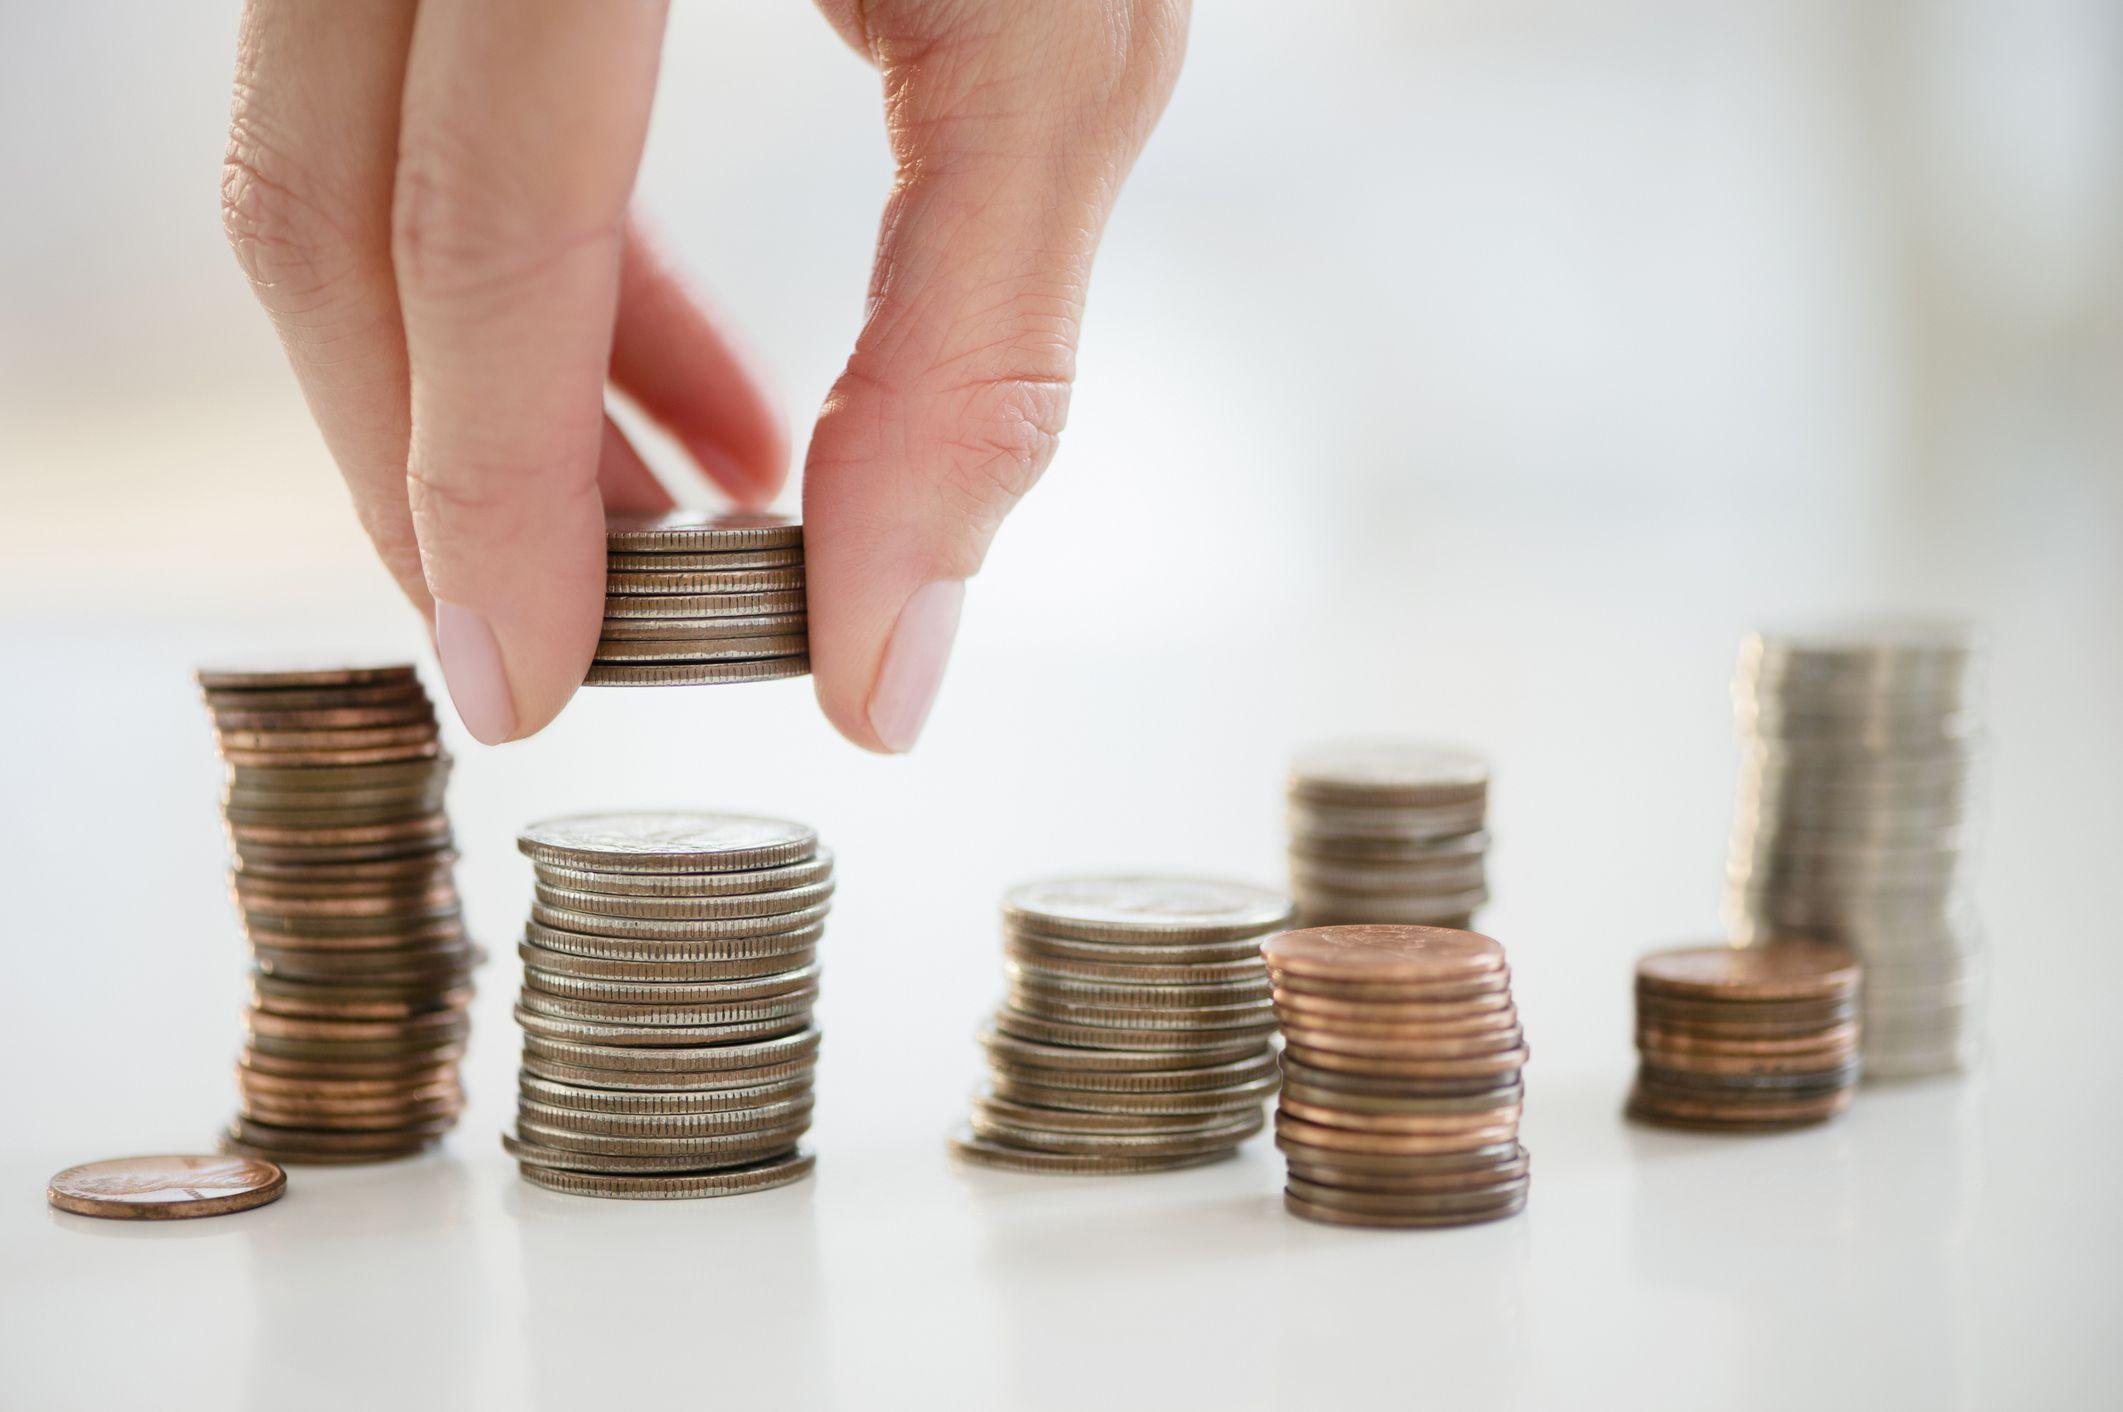 The Basics Of Budgeting And Saving Money